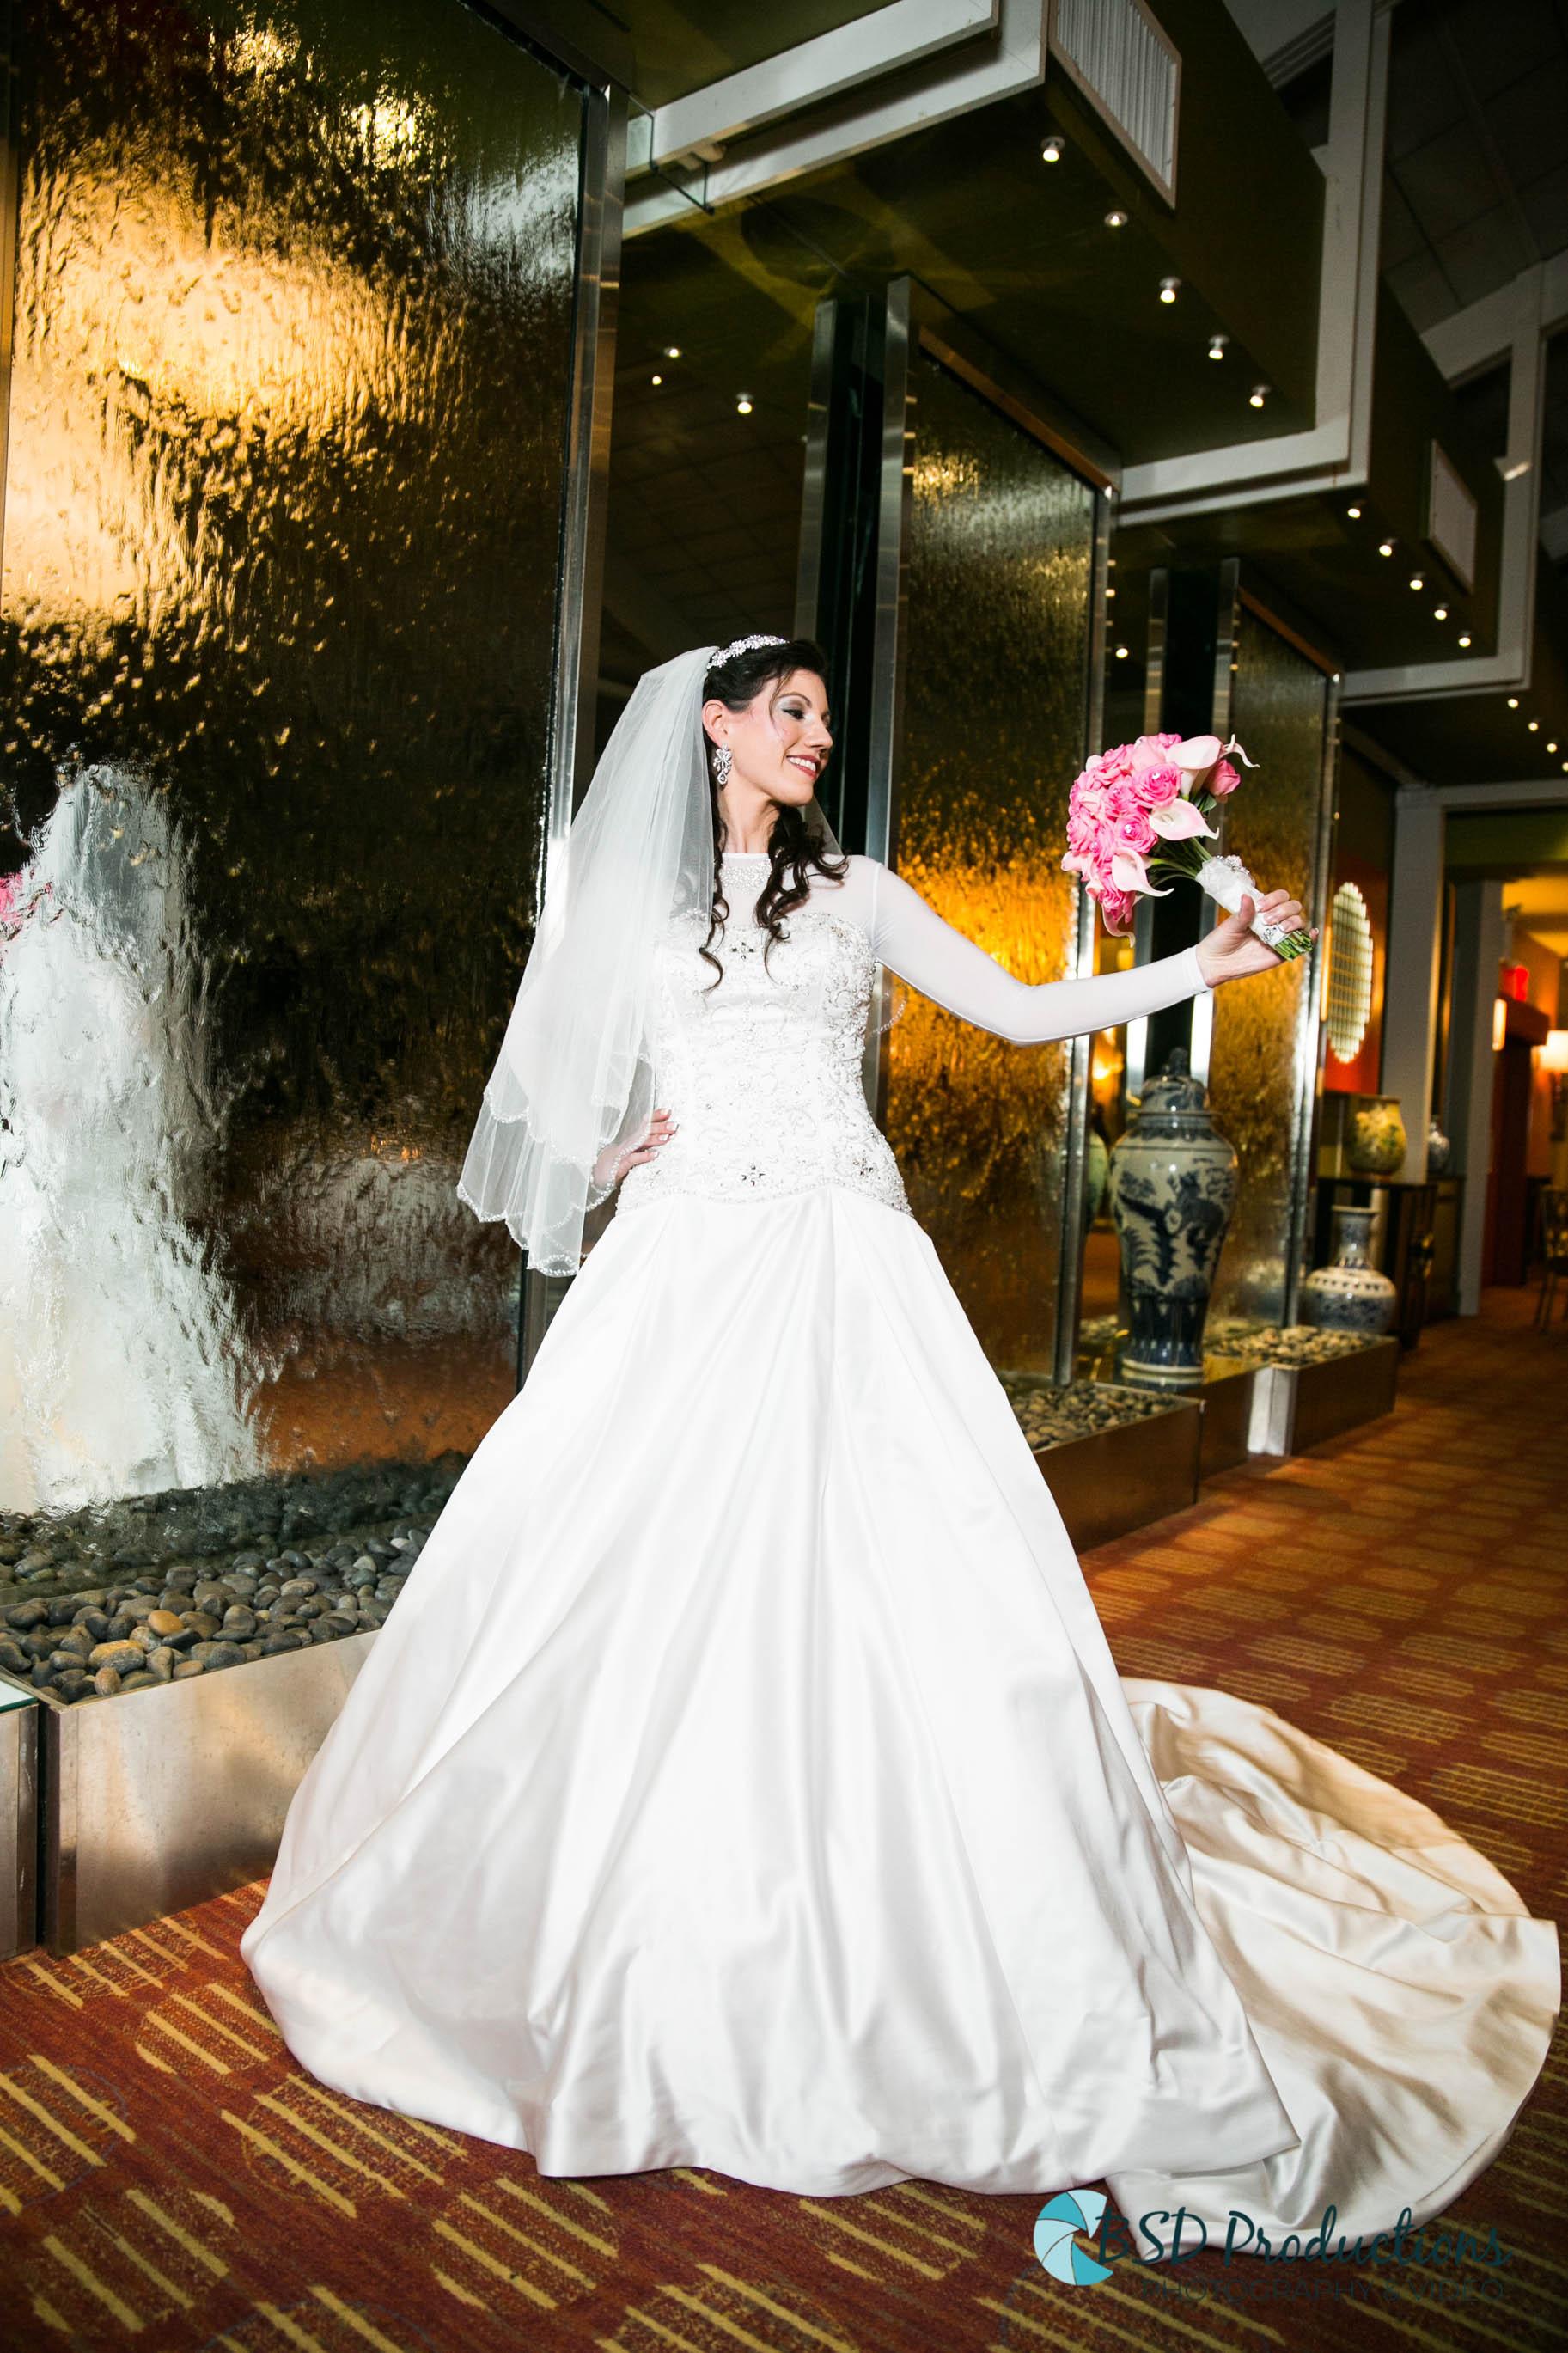 D_R_9871 Wedding – BSD Productions Photography